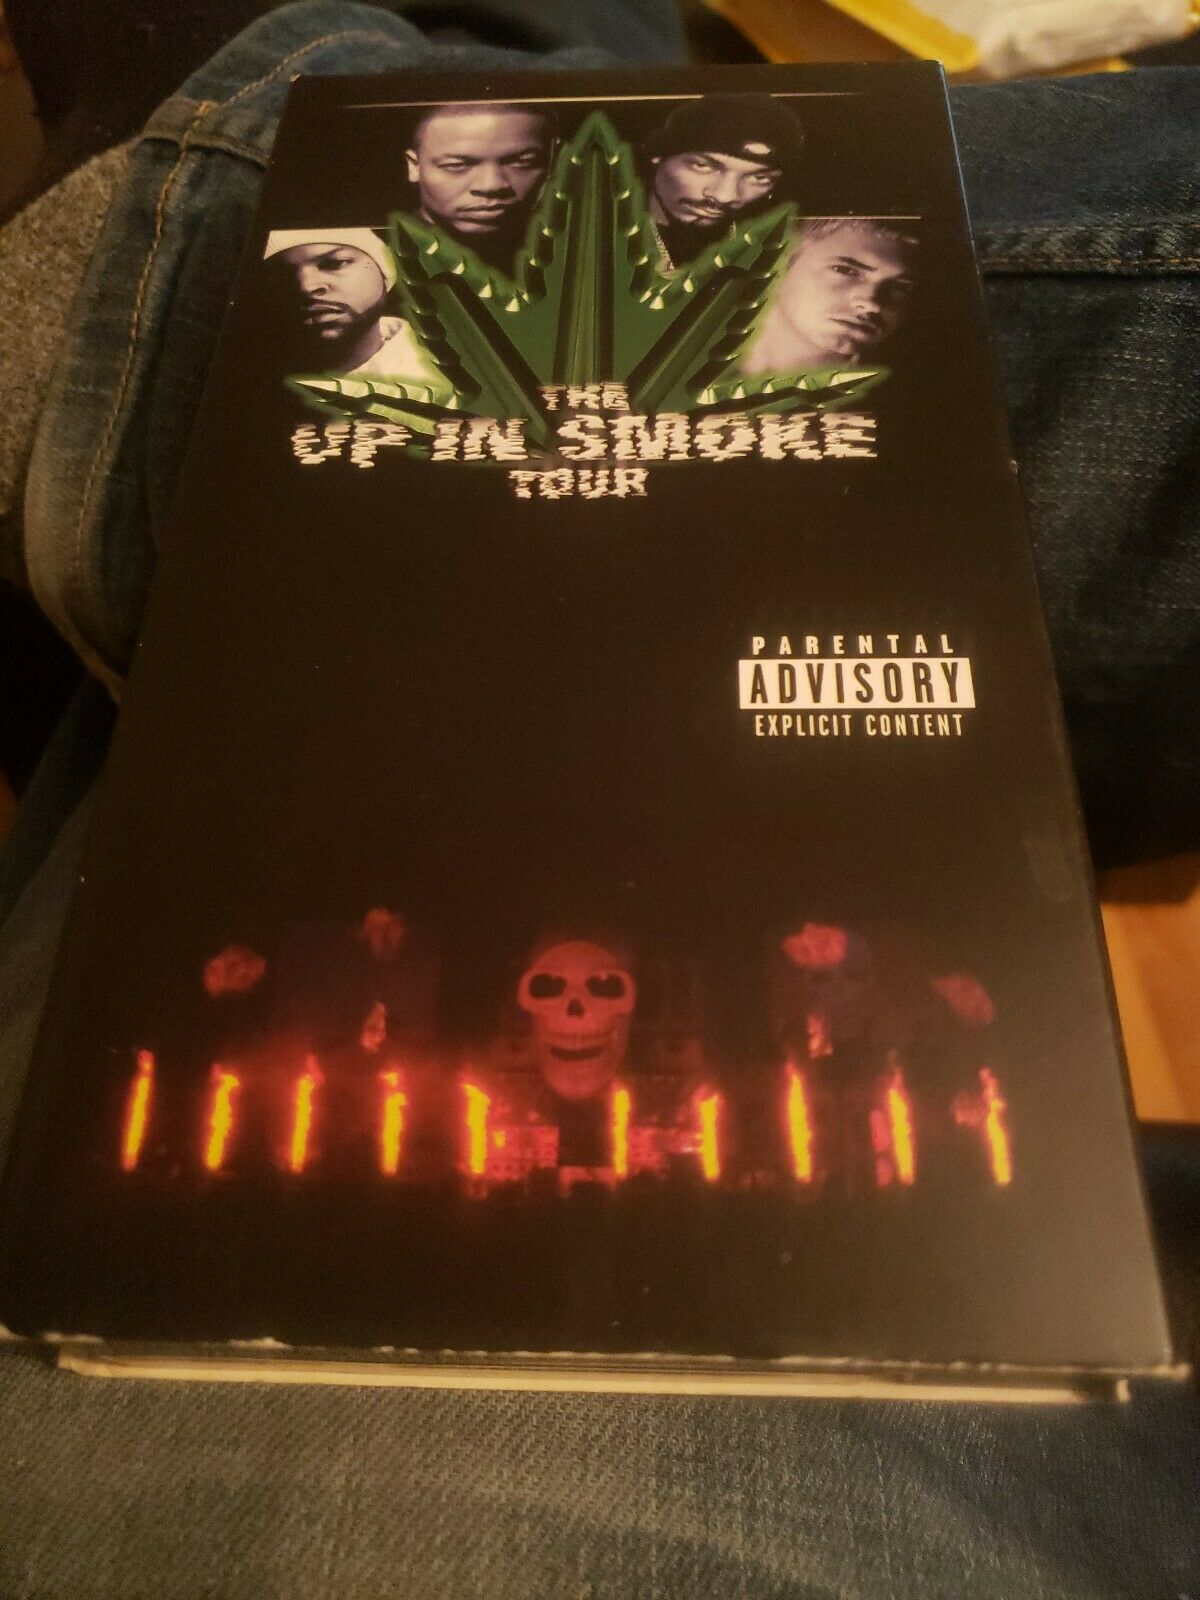 The Up In Smoke Tour VHS 2000 Tape Dr. Dre Snoop Dog Eminem Ice Cube Rap Hip Hop